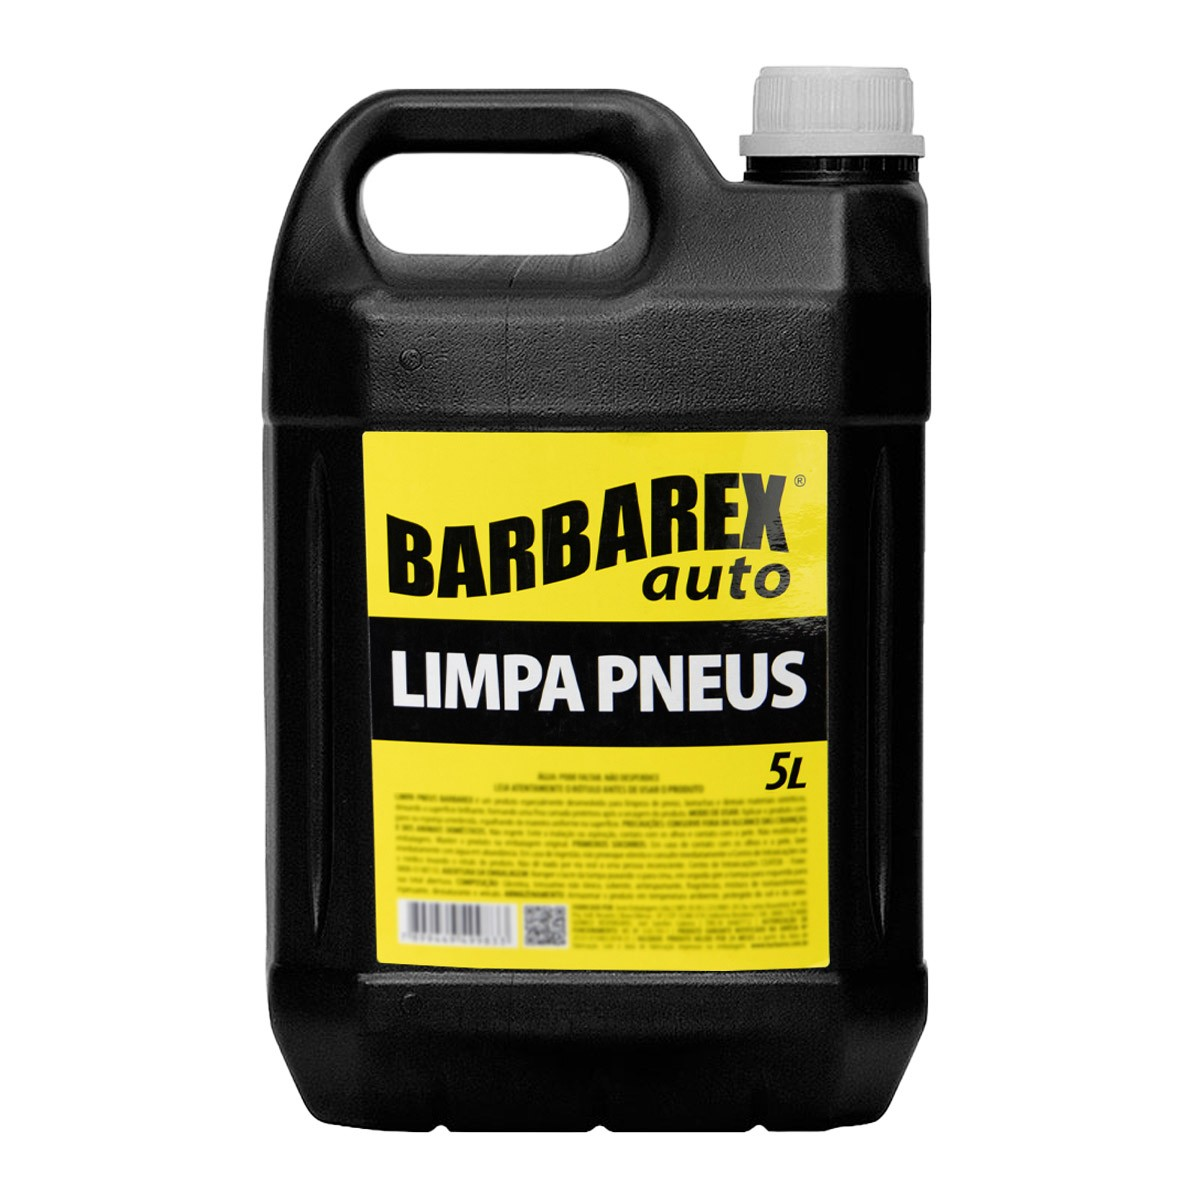 Barbarex Auto Limpa Pneus 5 Litros